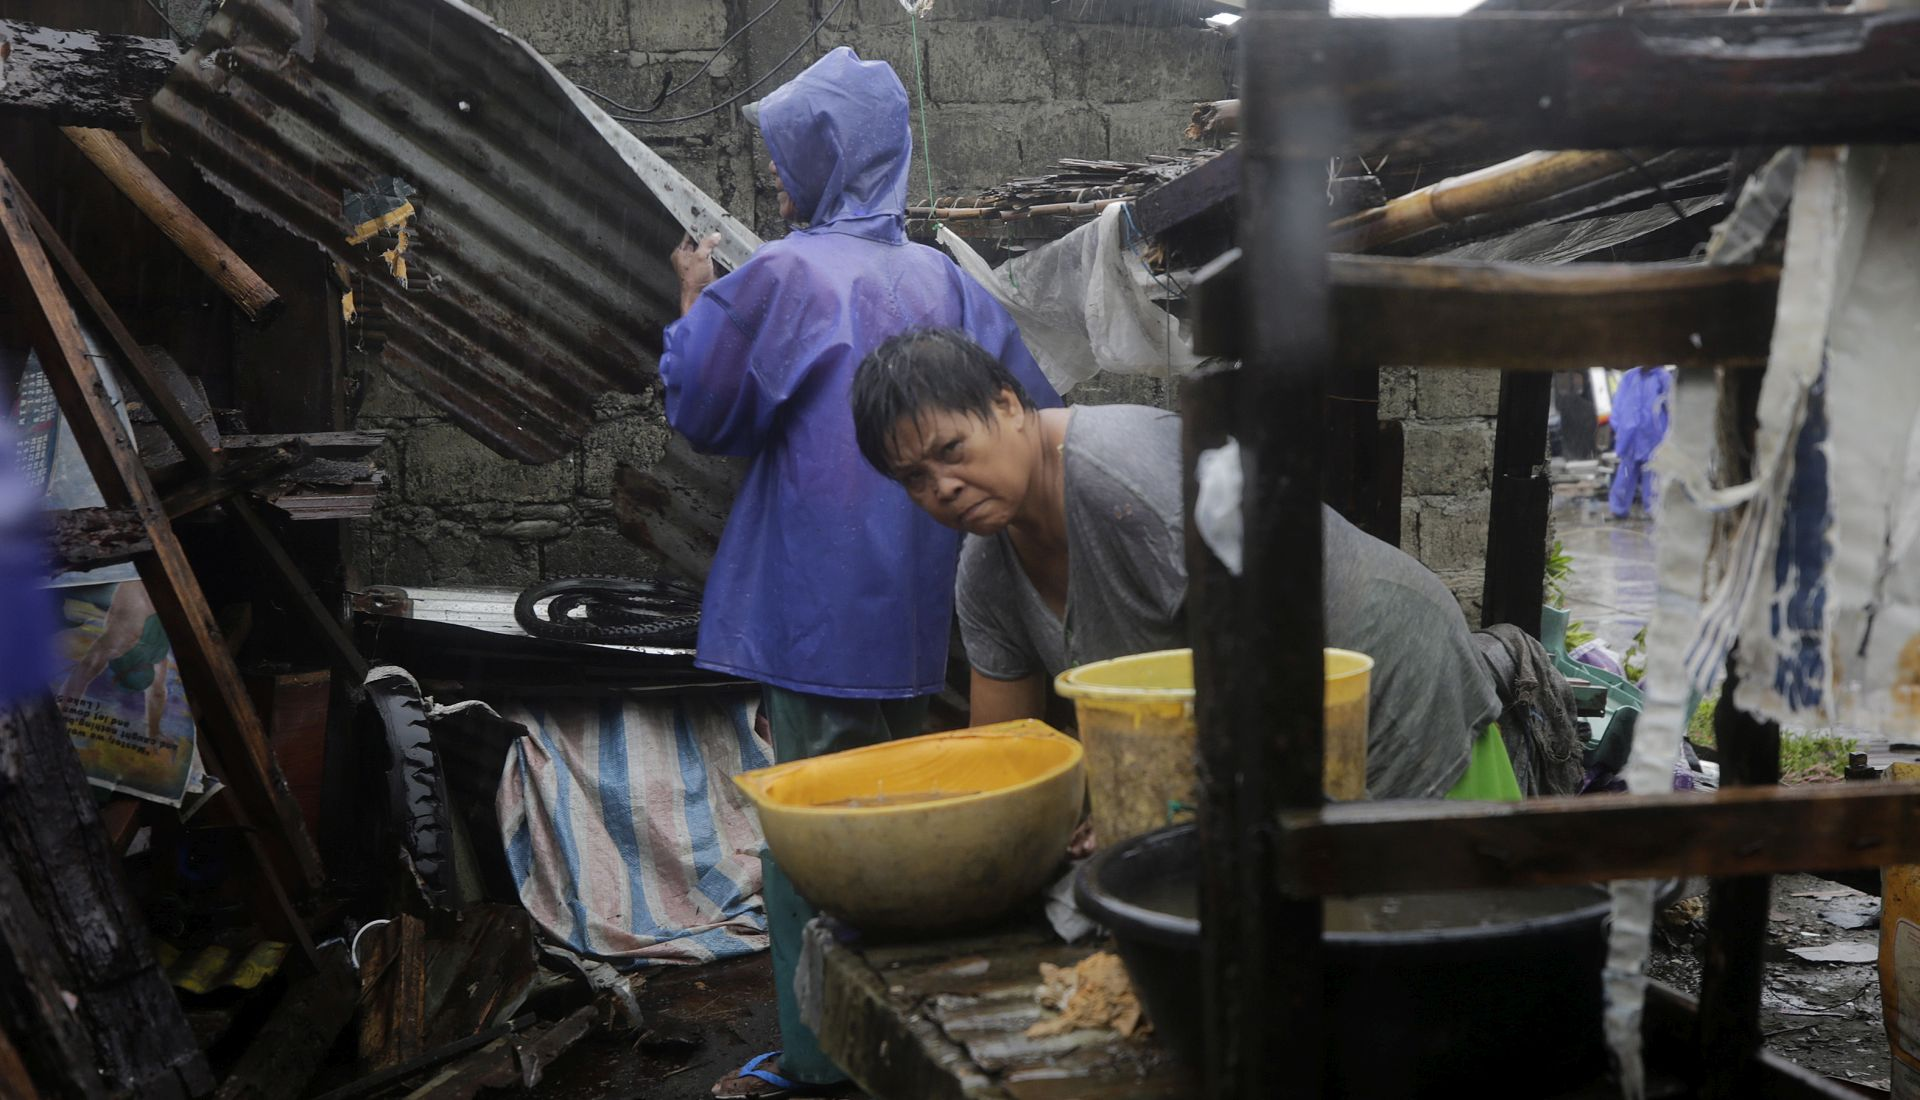 Tajfun Mangkut pogodio sjever Filipina